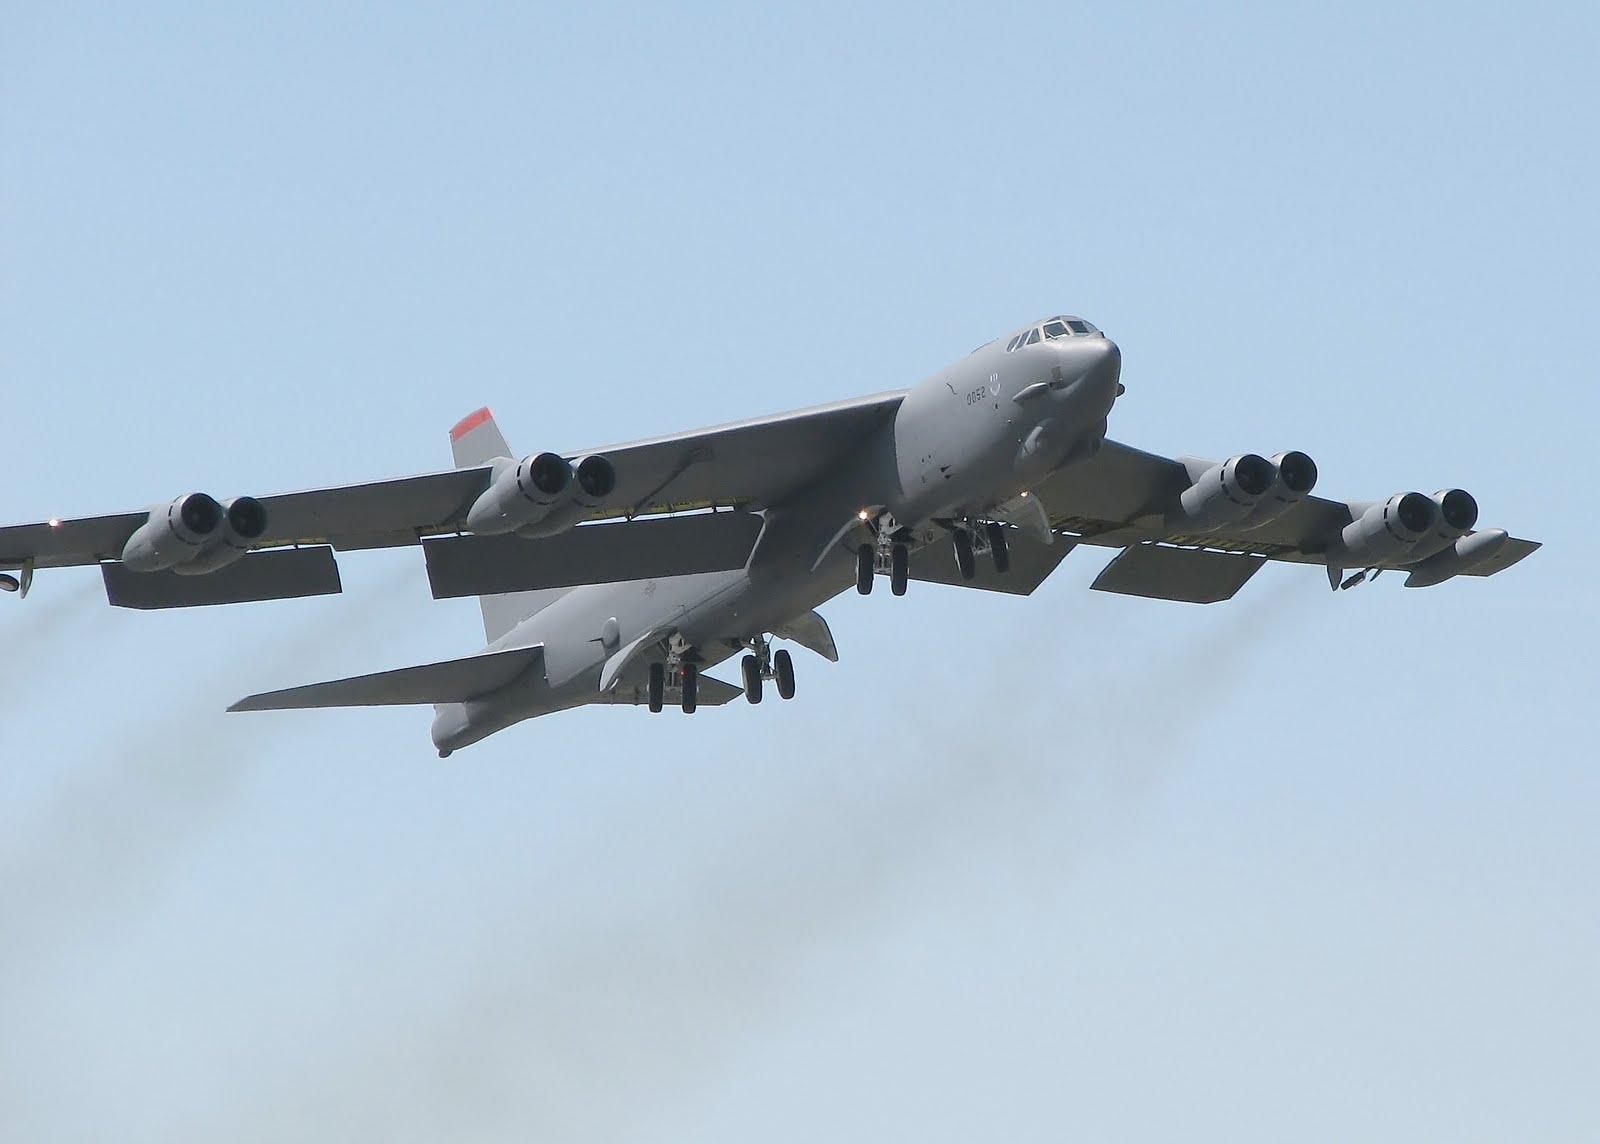 Sky Fighter: Boeing B-52 Stratofortress